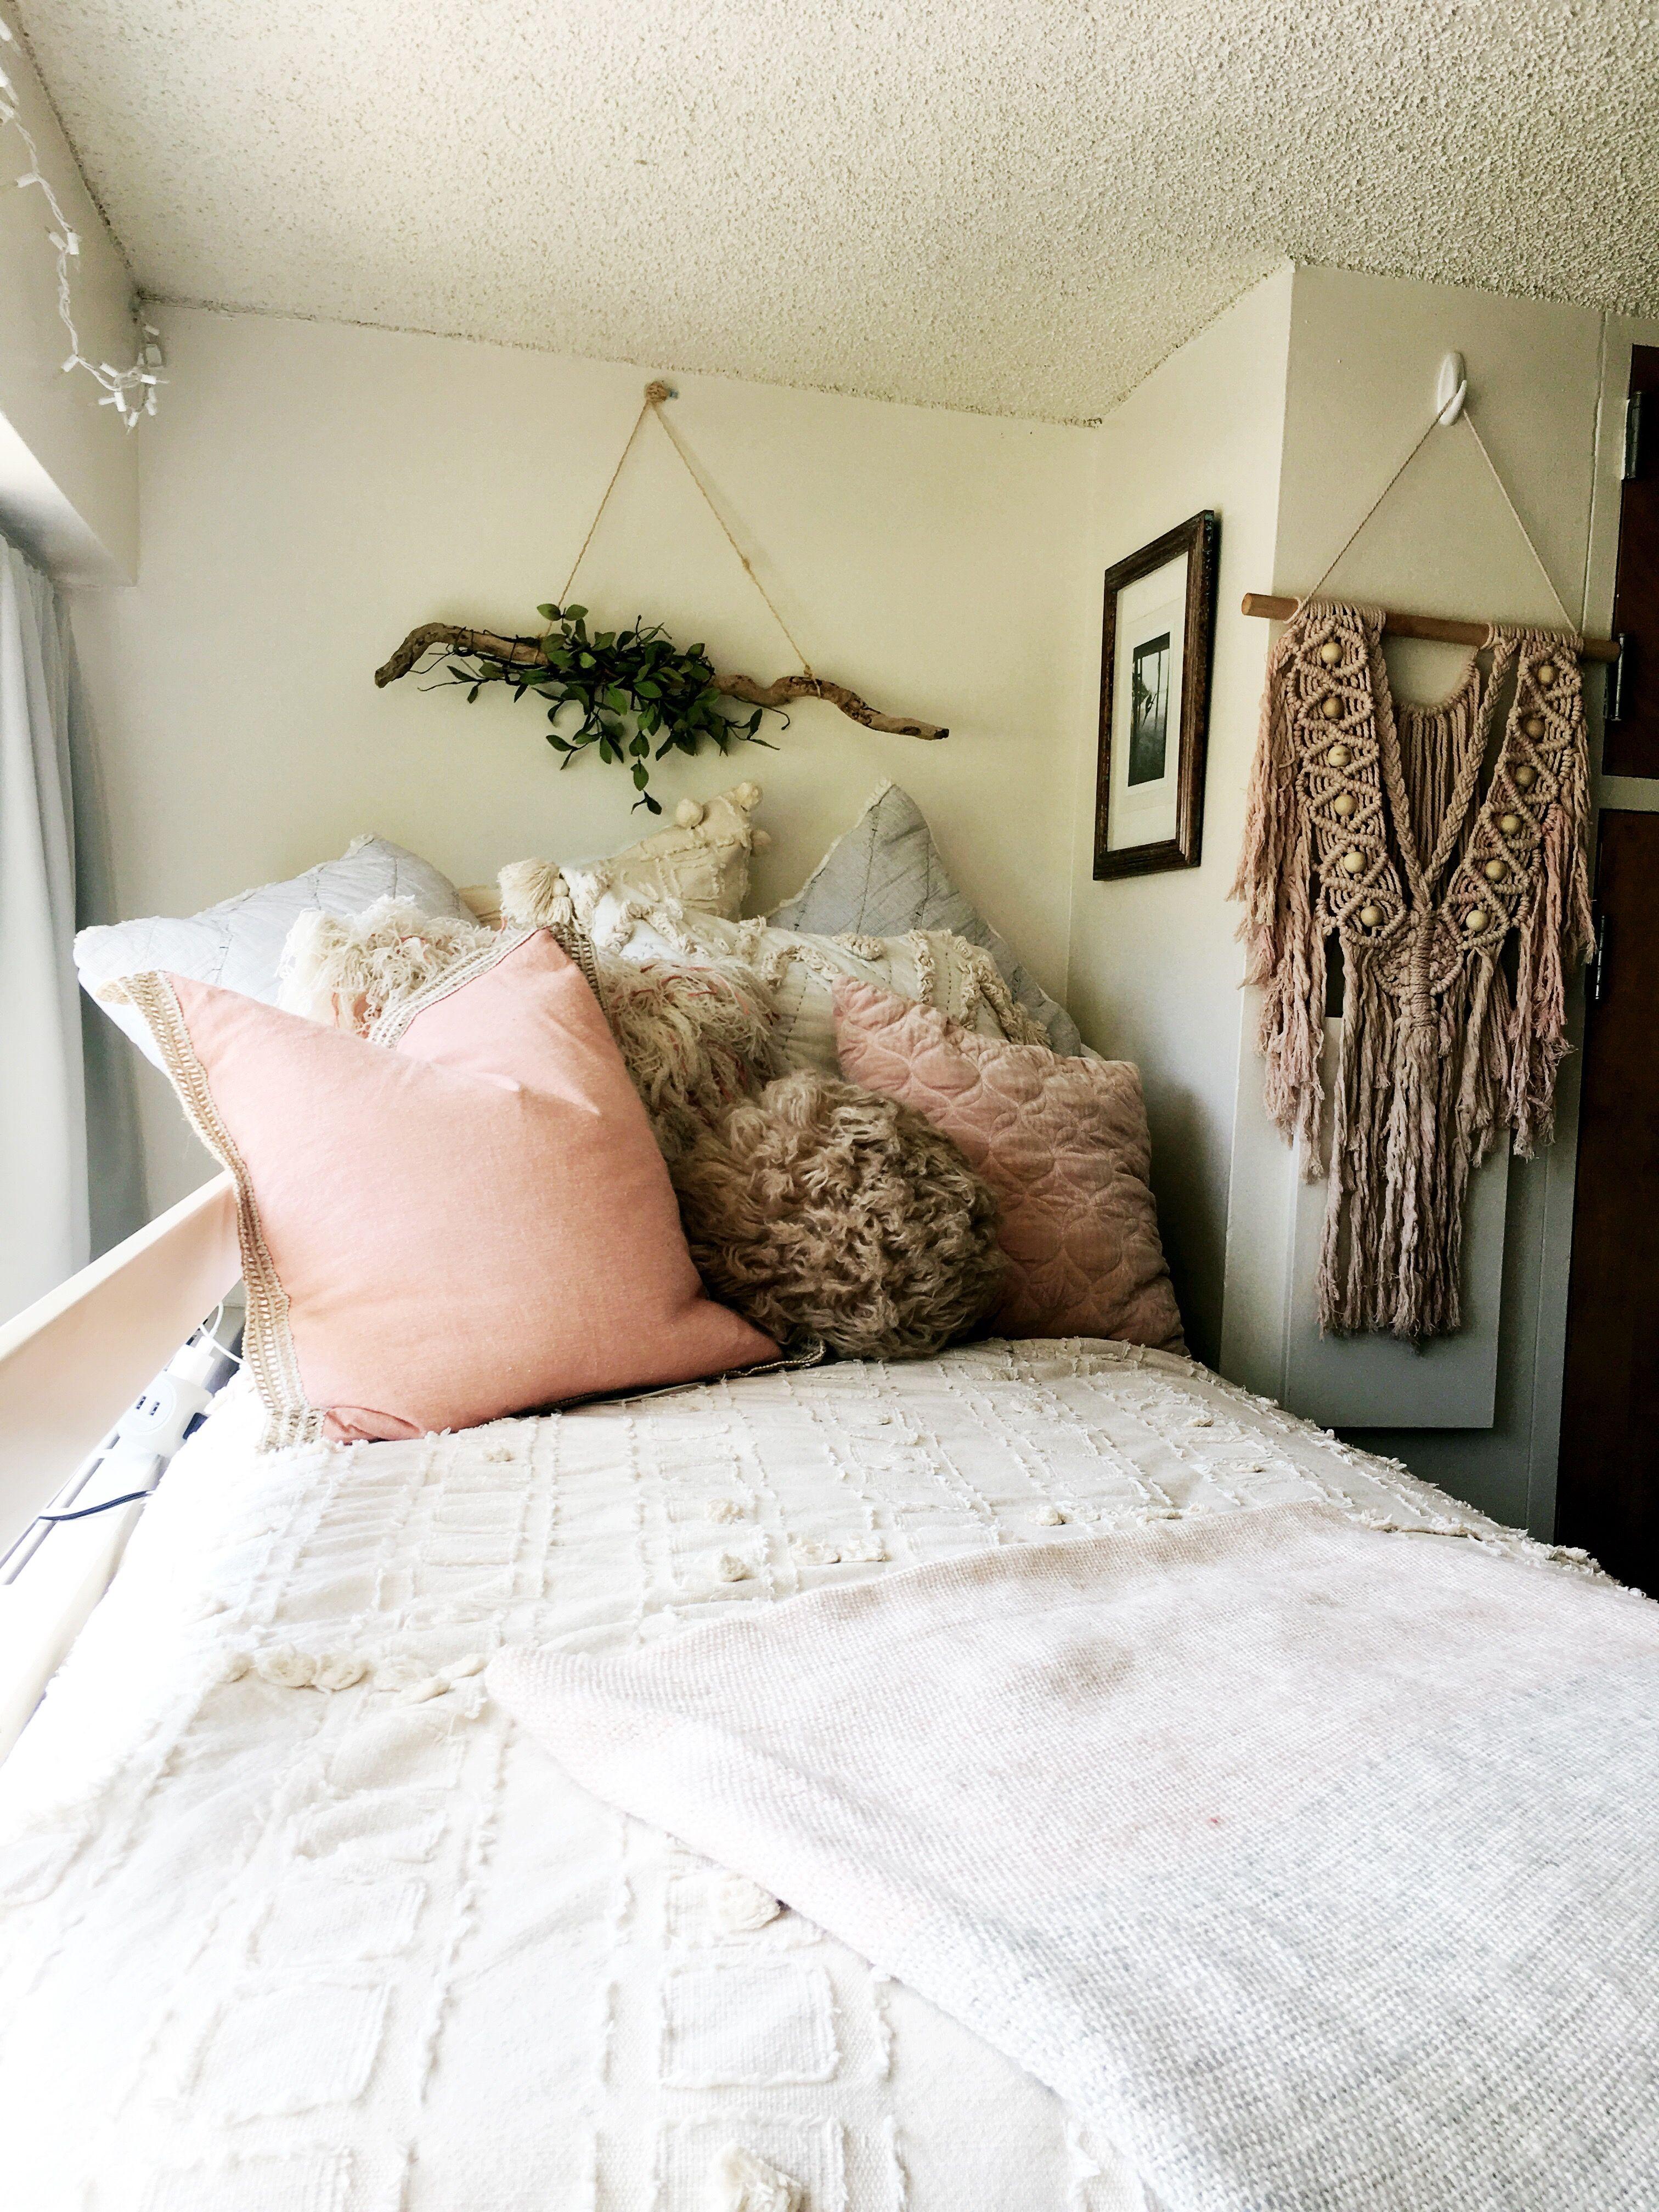 College Bedding Simple Cute Cutedormroom